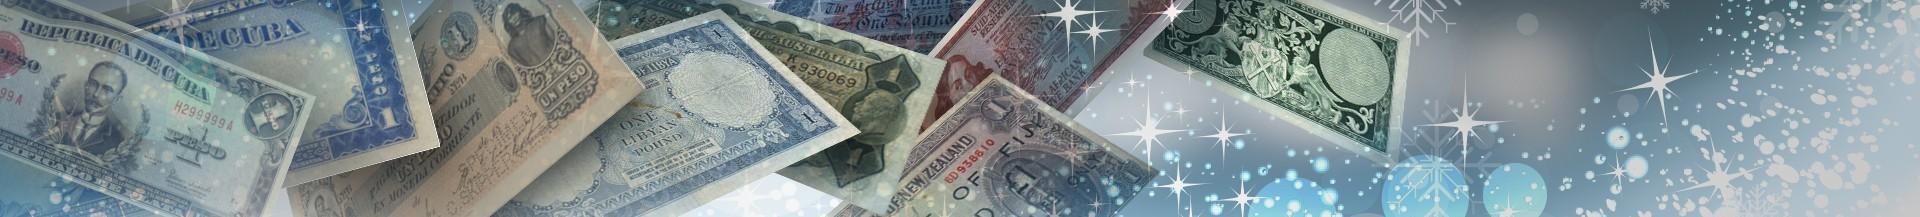 Banknoteworld.org